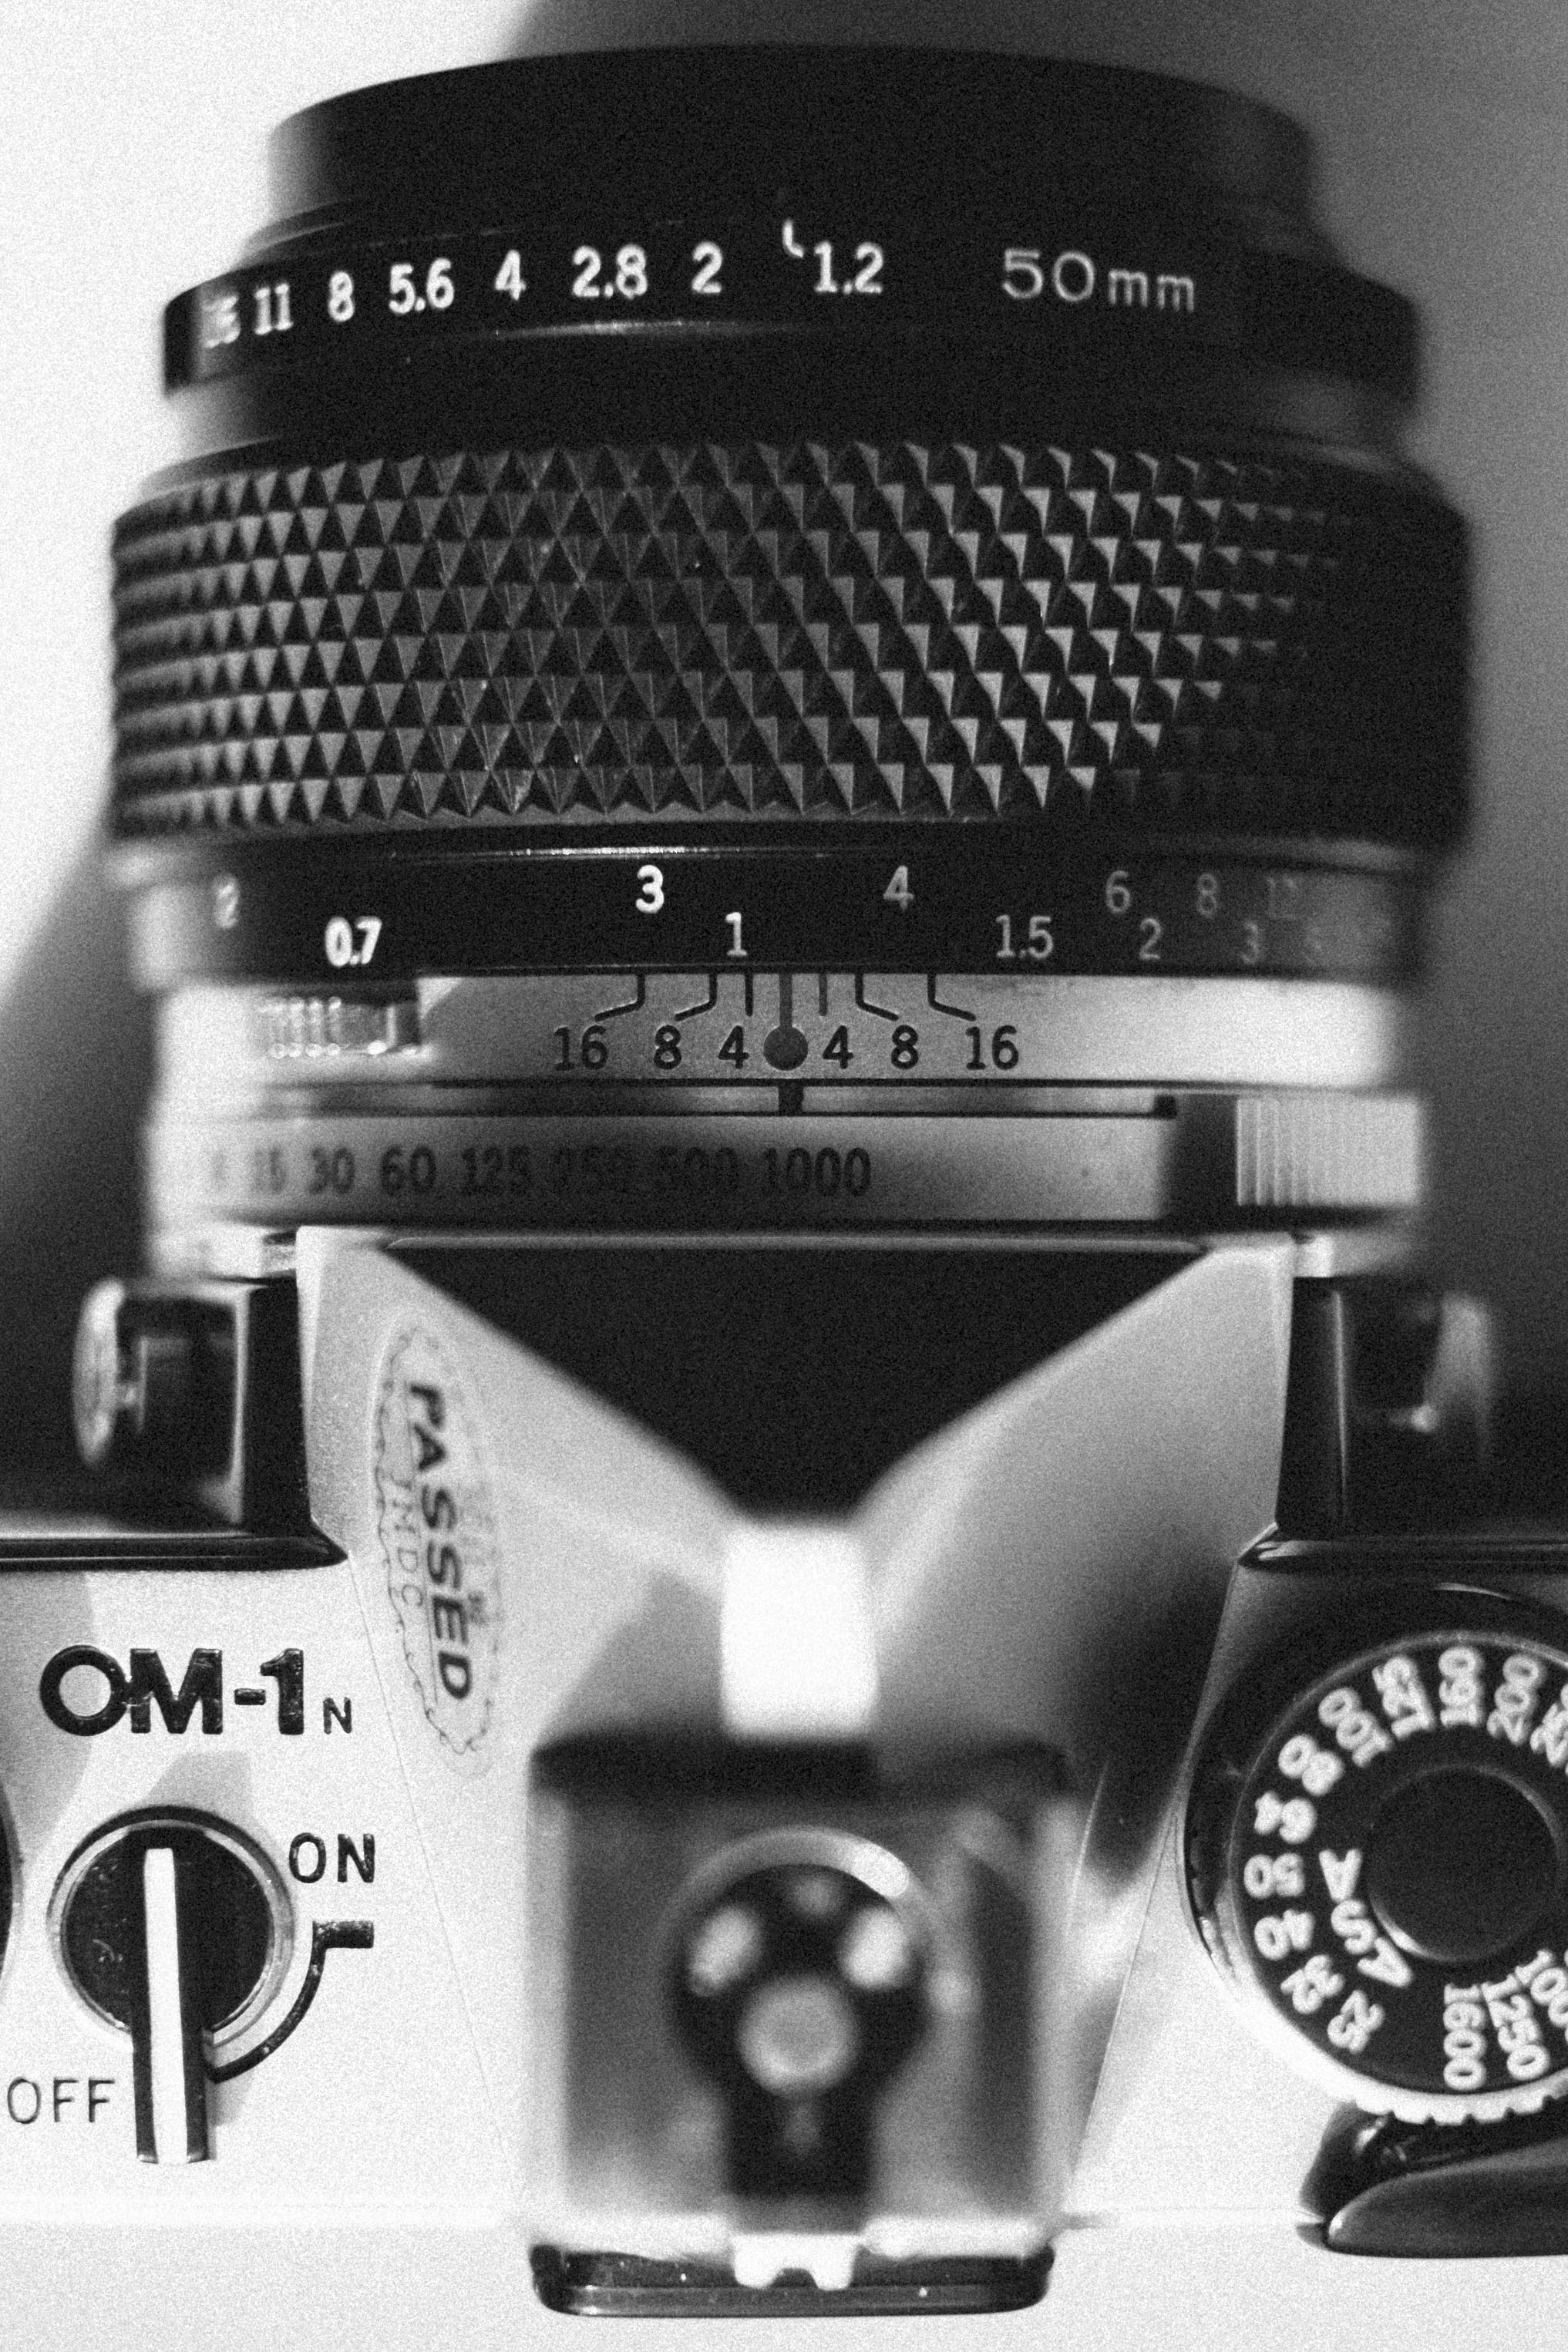 Grayscale Photo of Mirrorless Camera